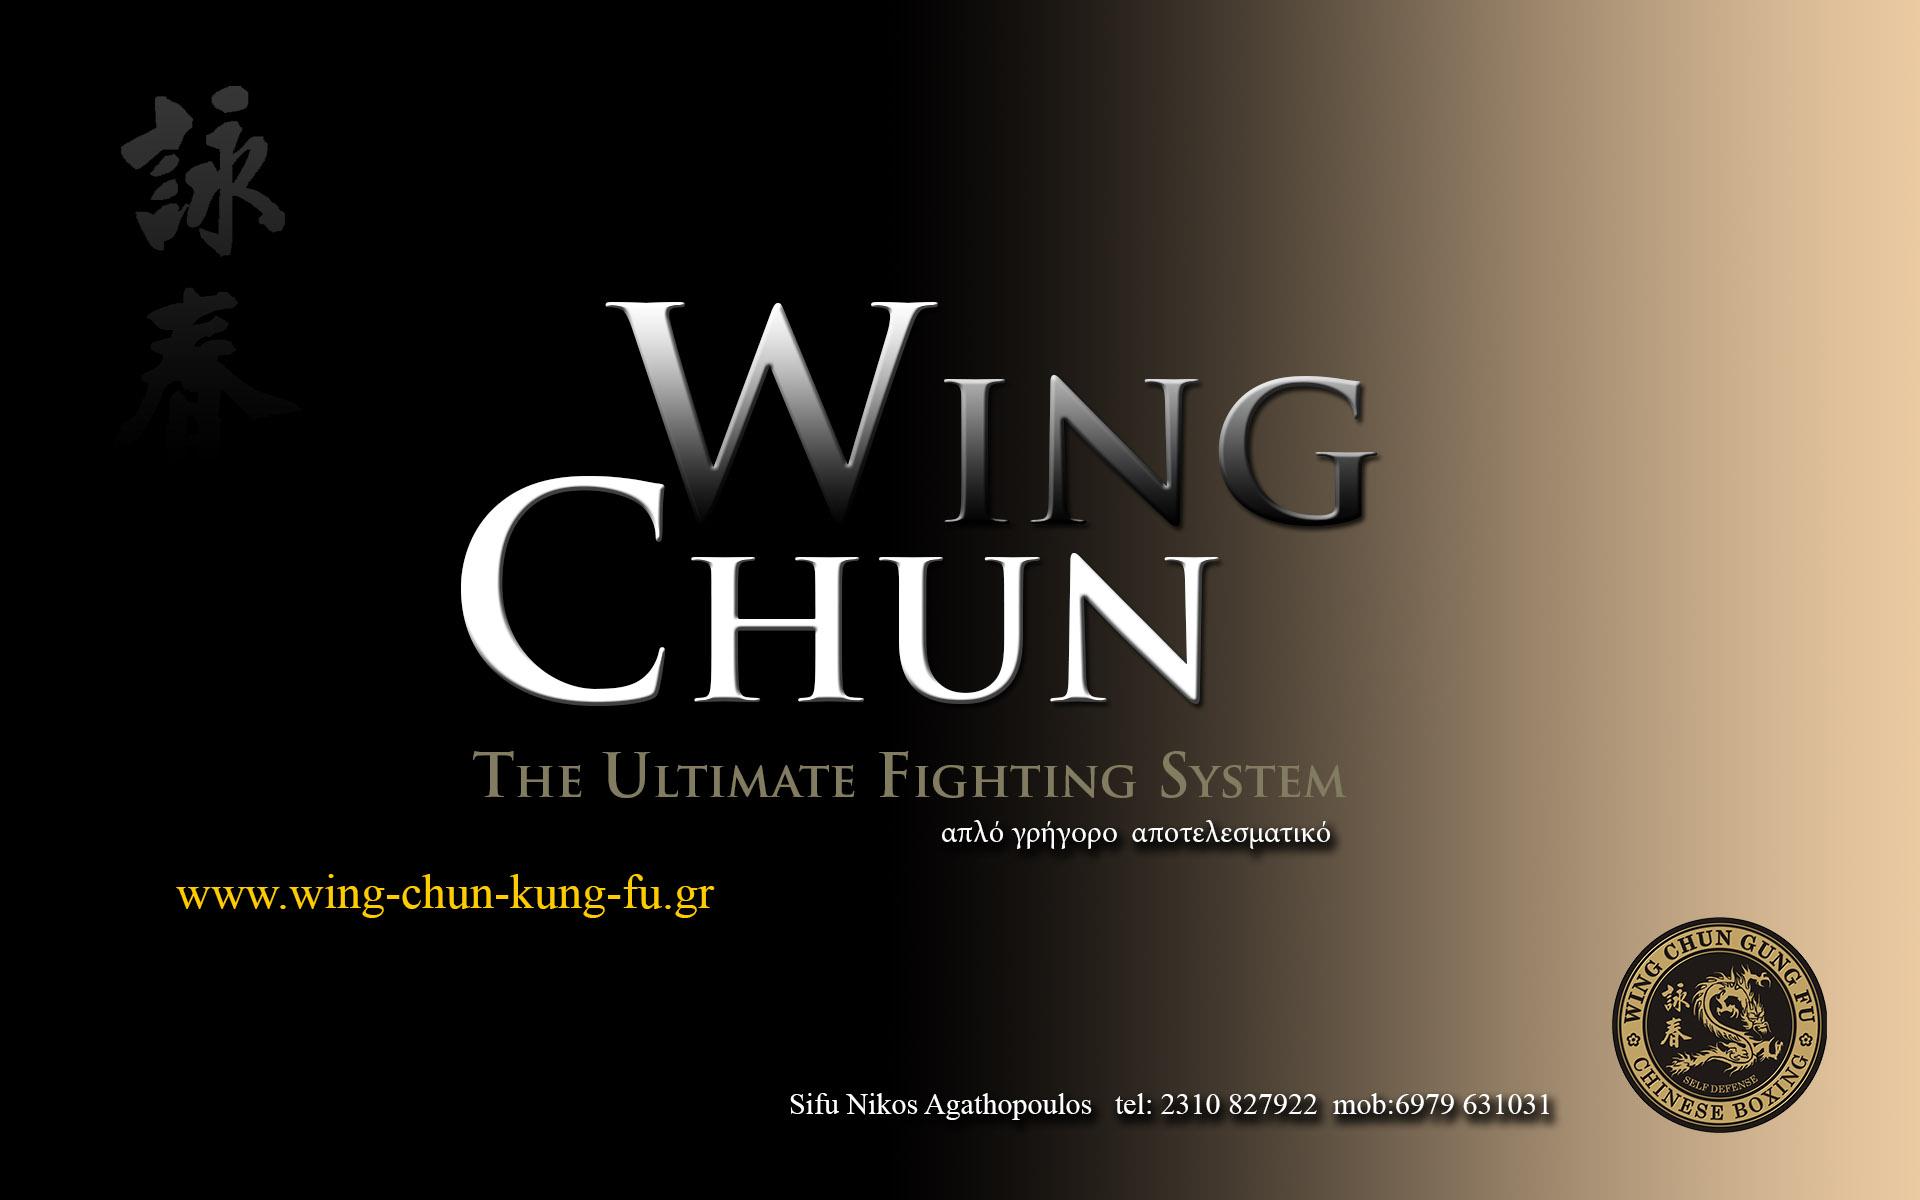 wing chun kung fu wallpaper 97400 | enews